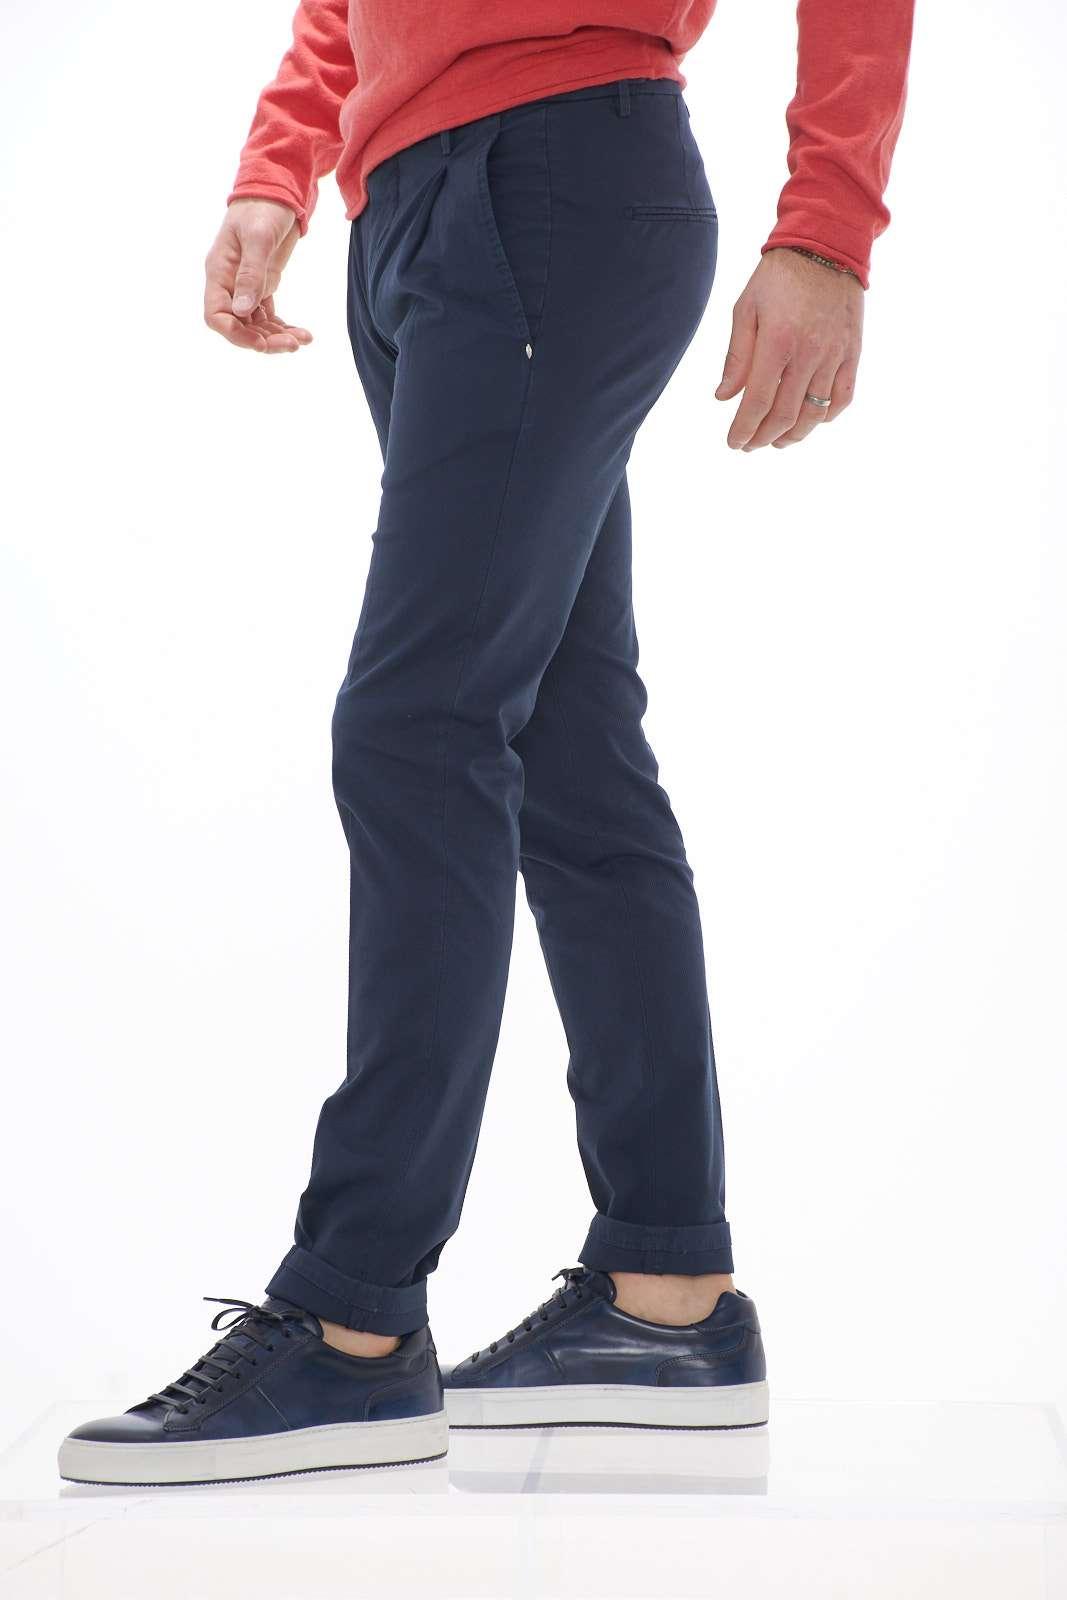 https://www.parmax.com/media/catalog/product/a/i/PE-outlet_parmax-pantaloni-uomo-Michael-Coal-FREDER2532-B.jpg